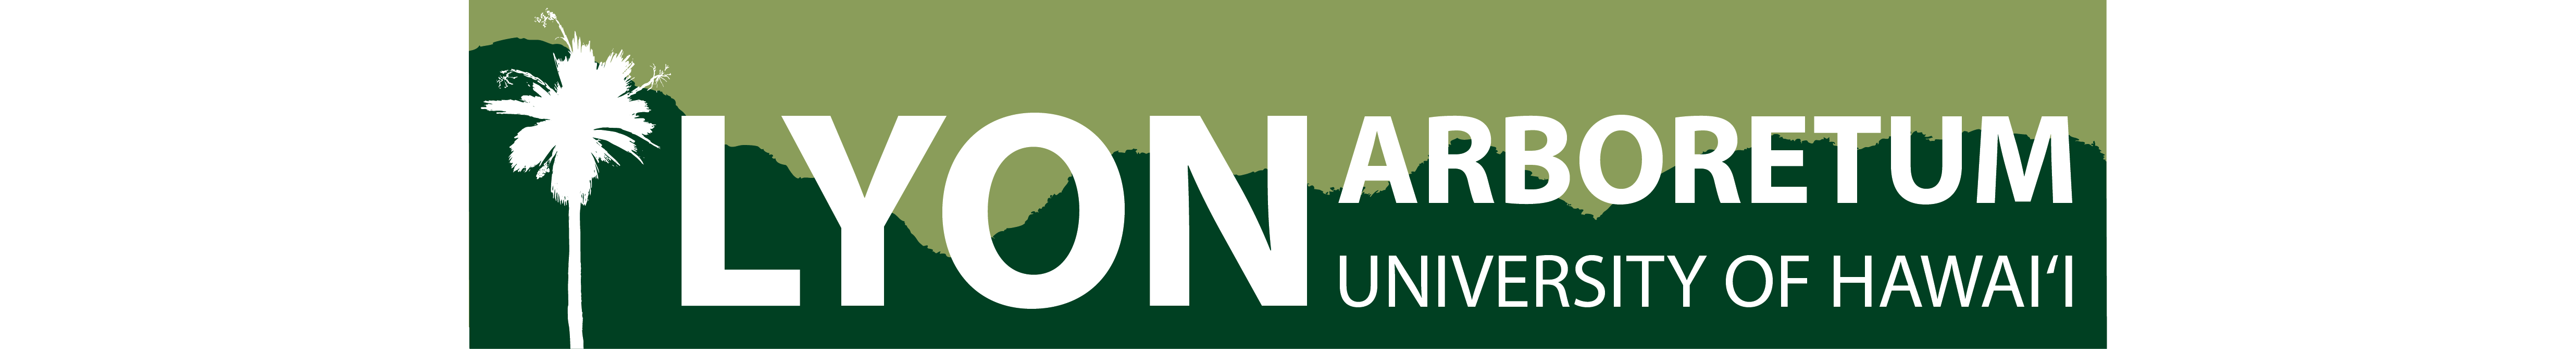 Lyon Arboretum. University of Hawaii.